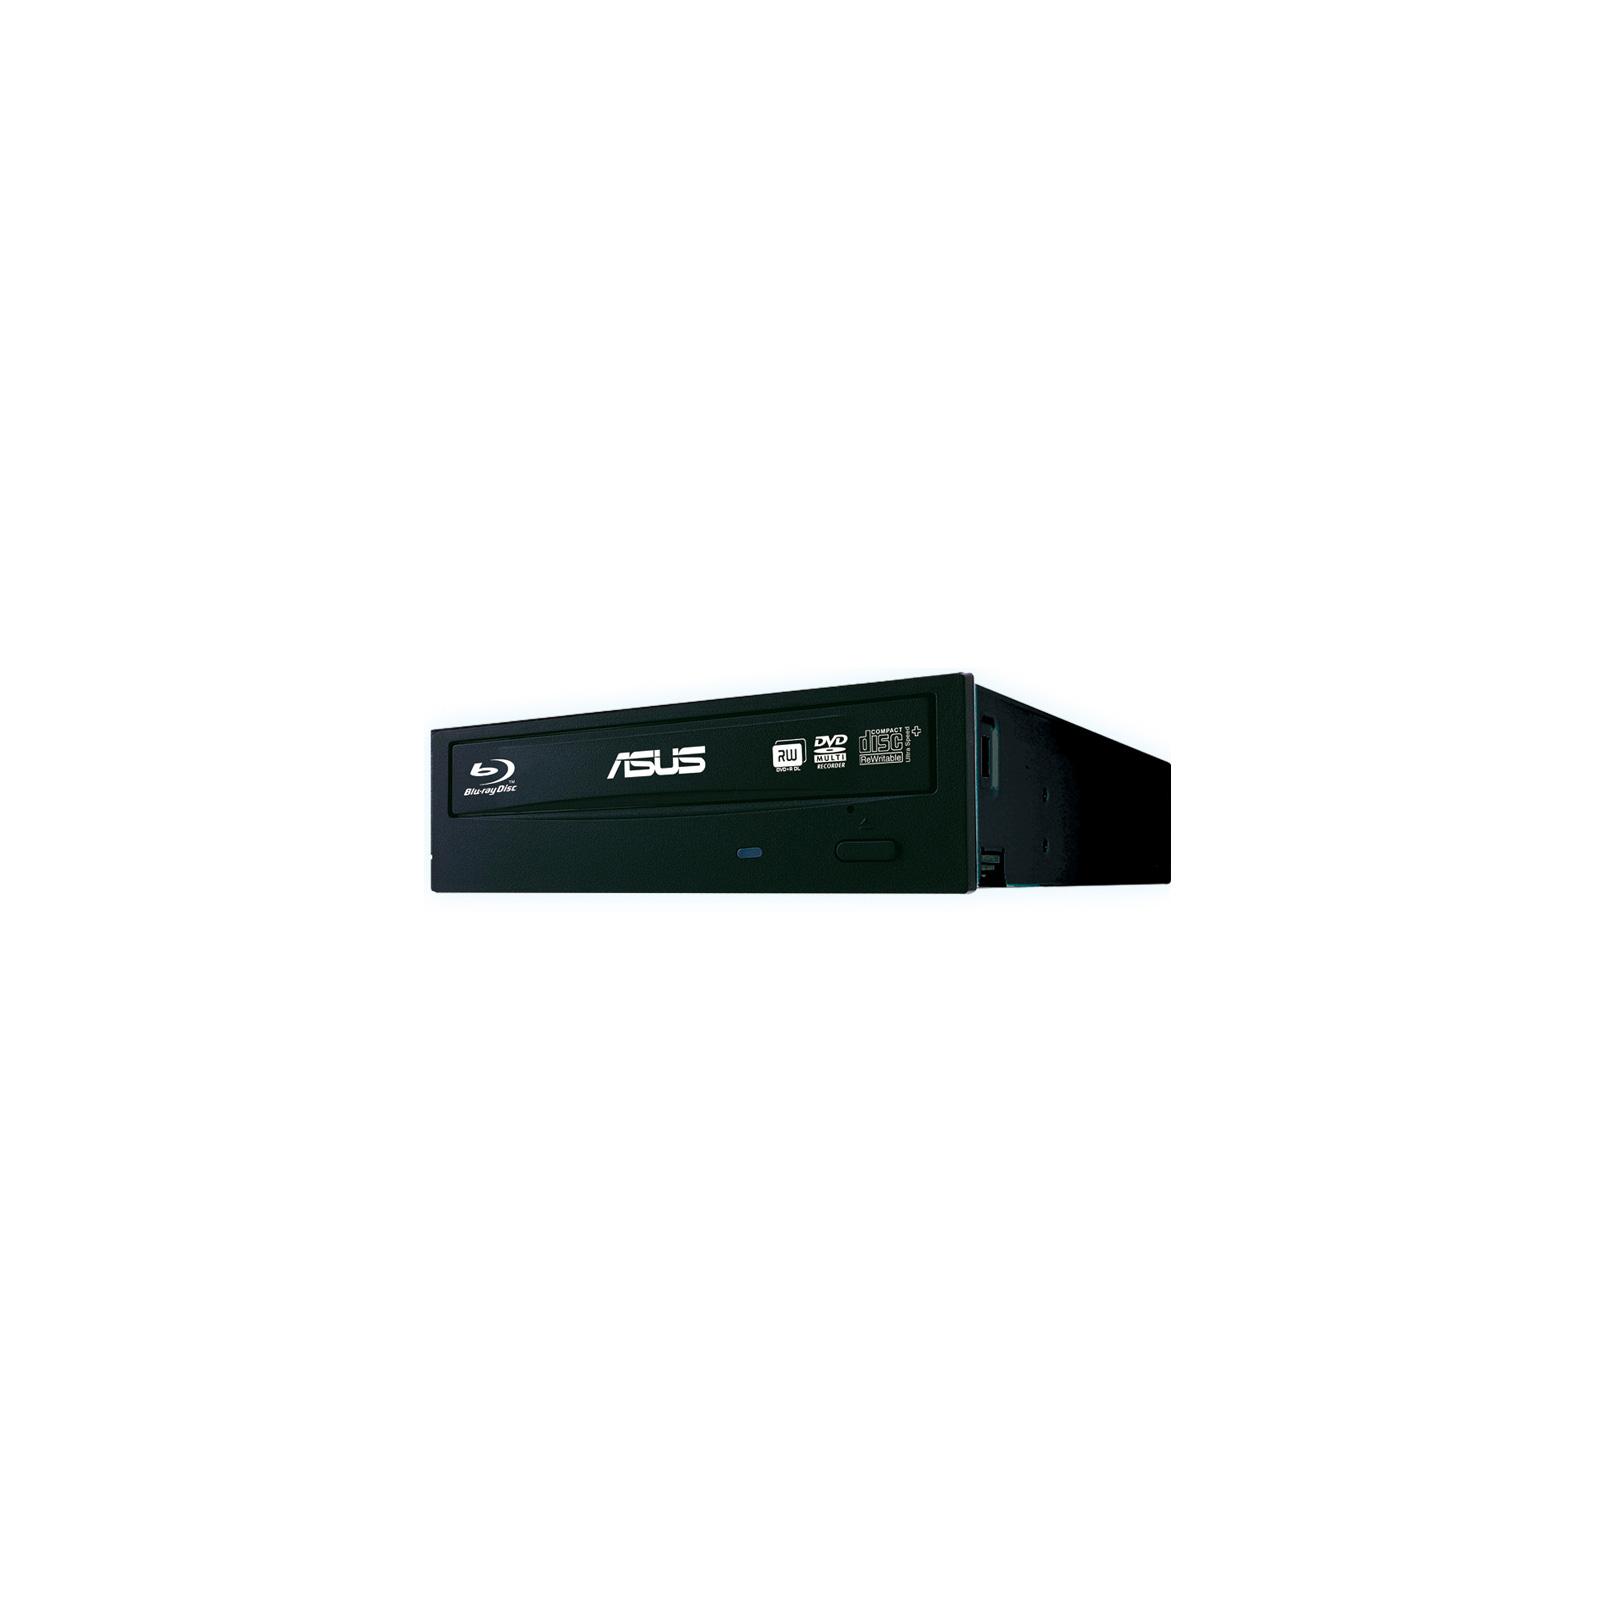 Оптический привод Blu-Ray ASUS BC-12D2HT/BLK/G/AS